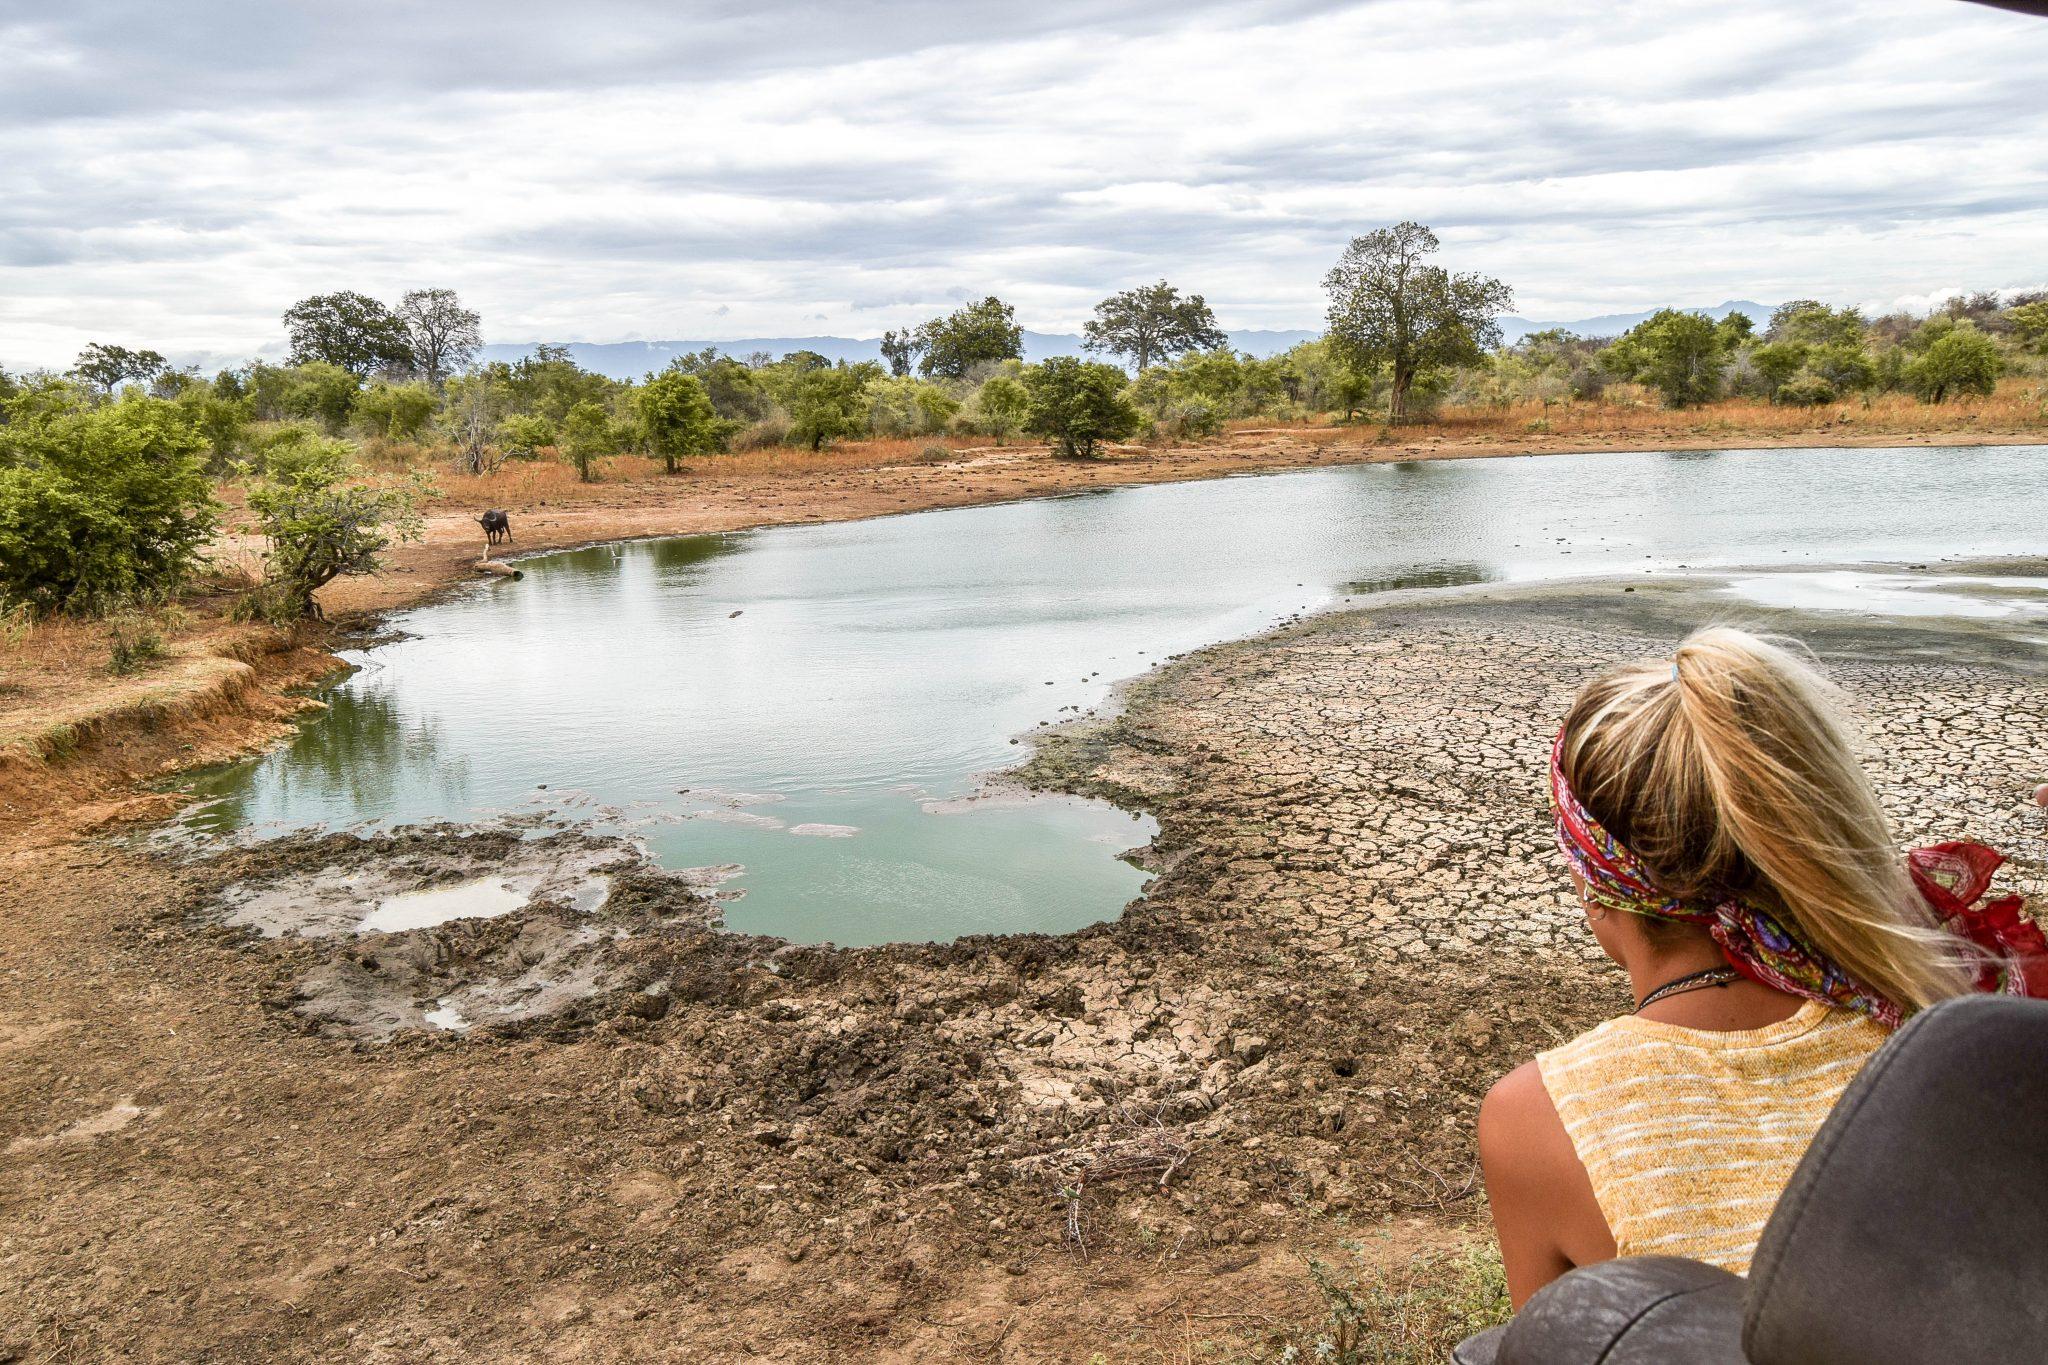 Wanderers & Warriors - Charlie & Lauren UK Travel Couple - Udawalawe Safari Crocodile Pool - Udawalawe National Park - The Best Safari In Sri Lanka